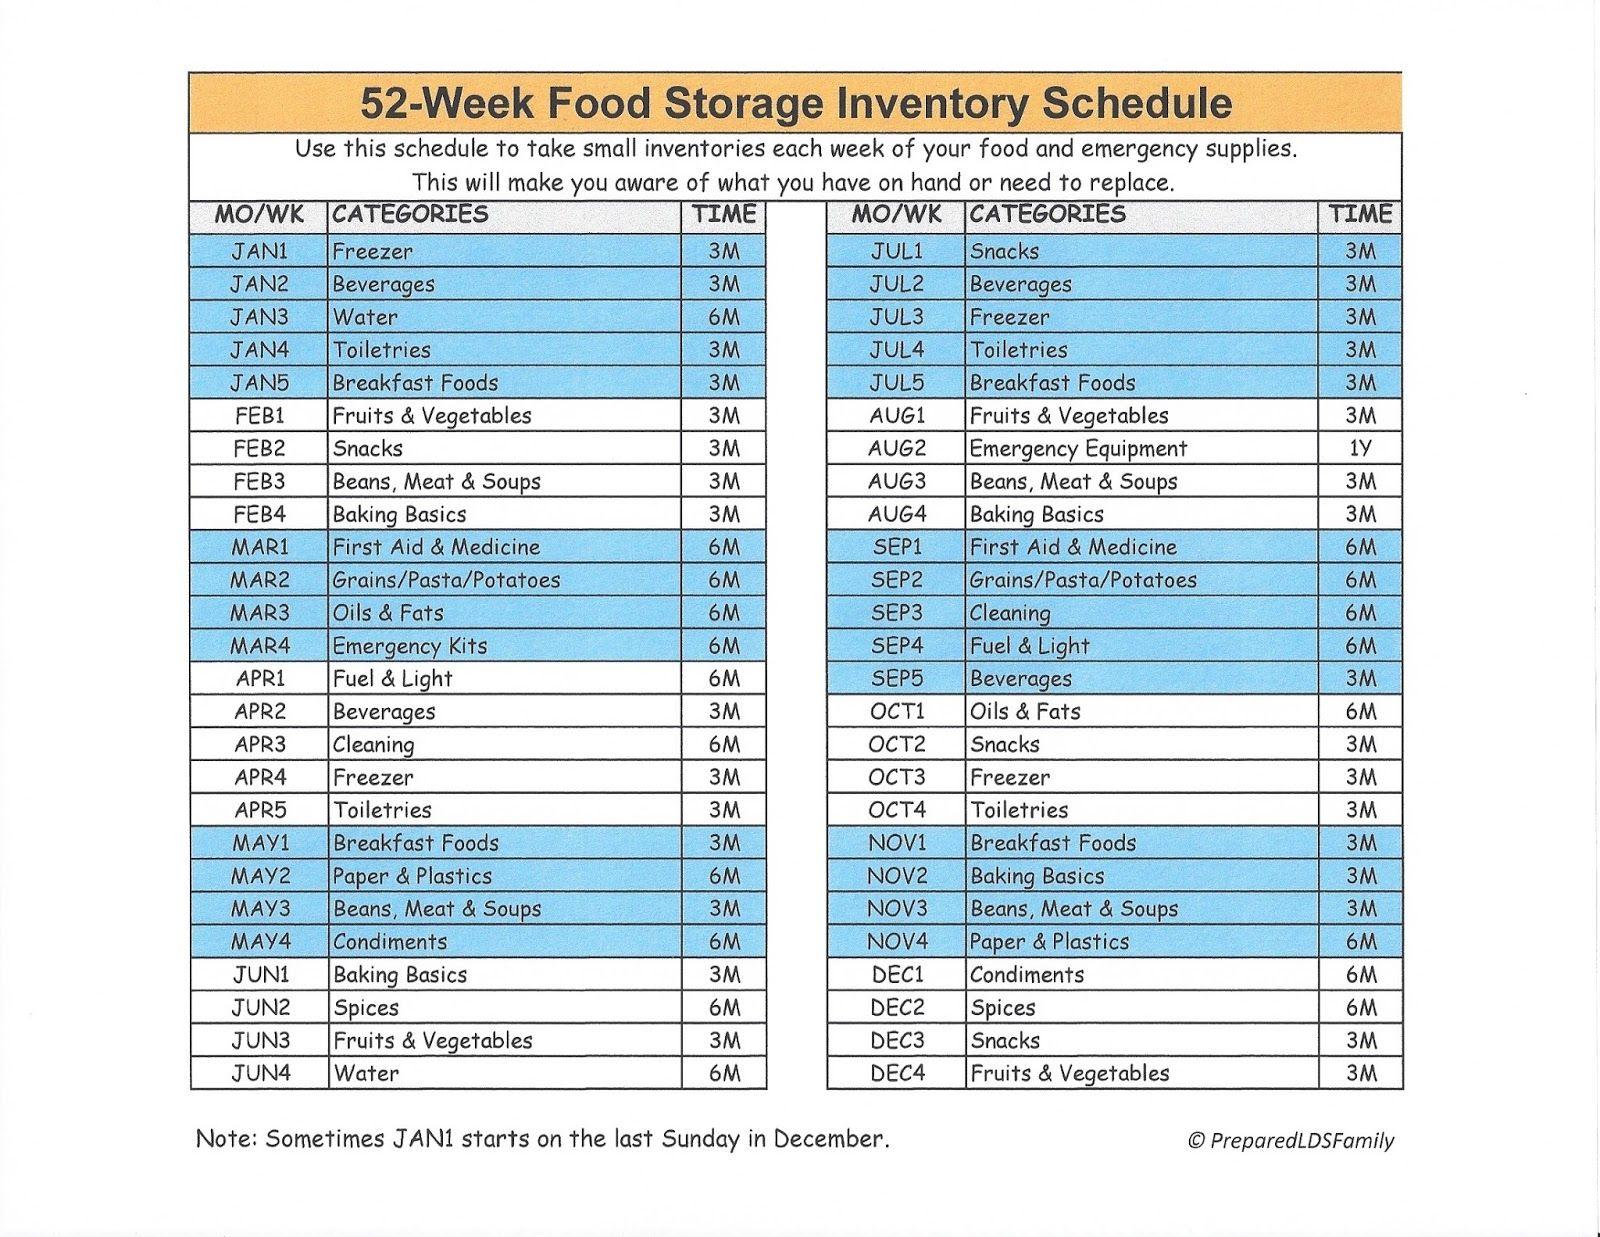 Prepared Lds Family Updated 52 Week Food Storage Inventory Schedule Using Calendar